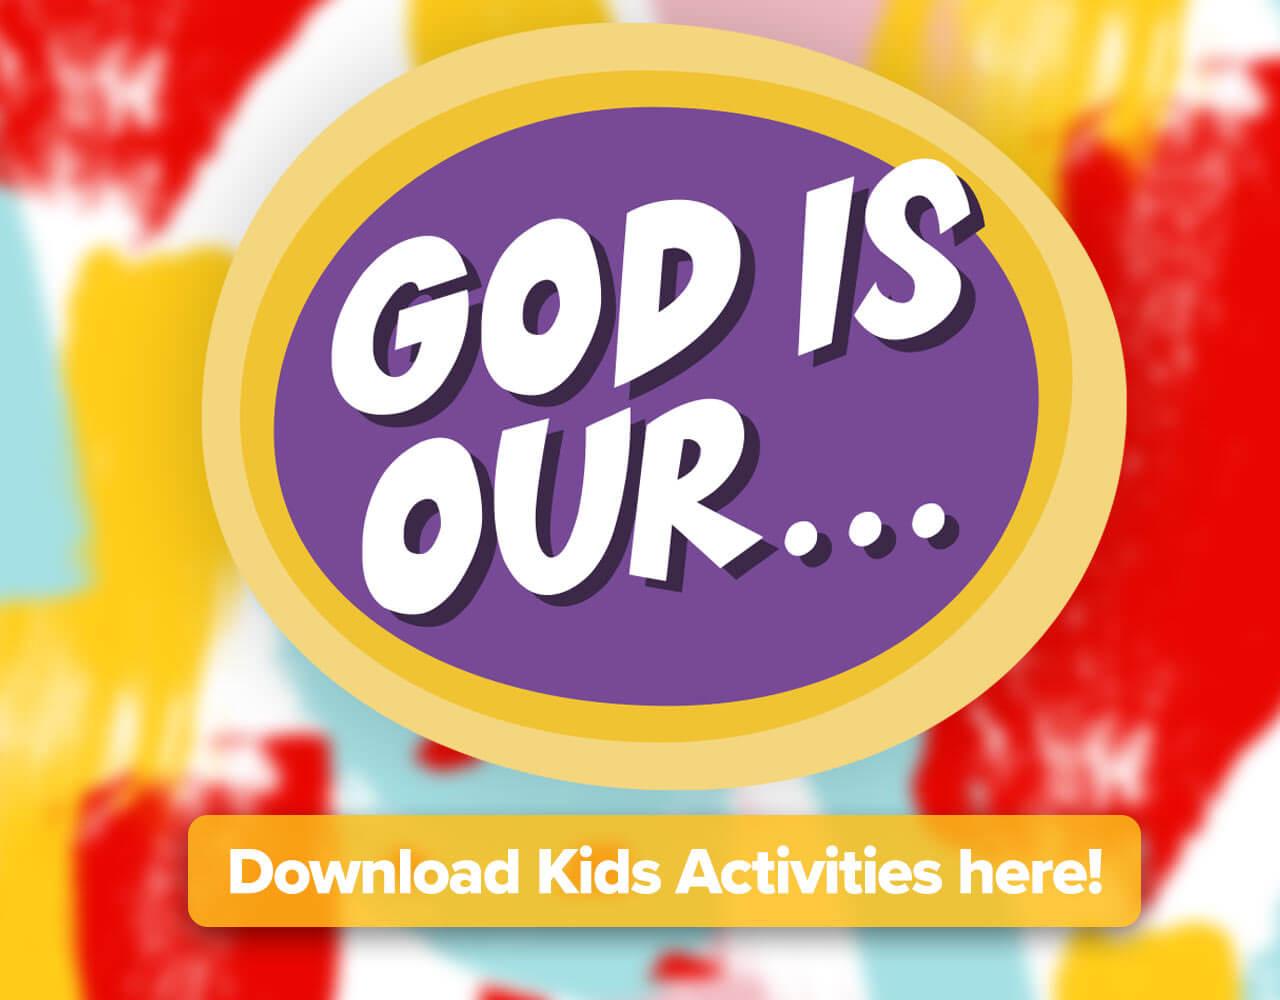 Download Kids crafts here!